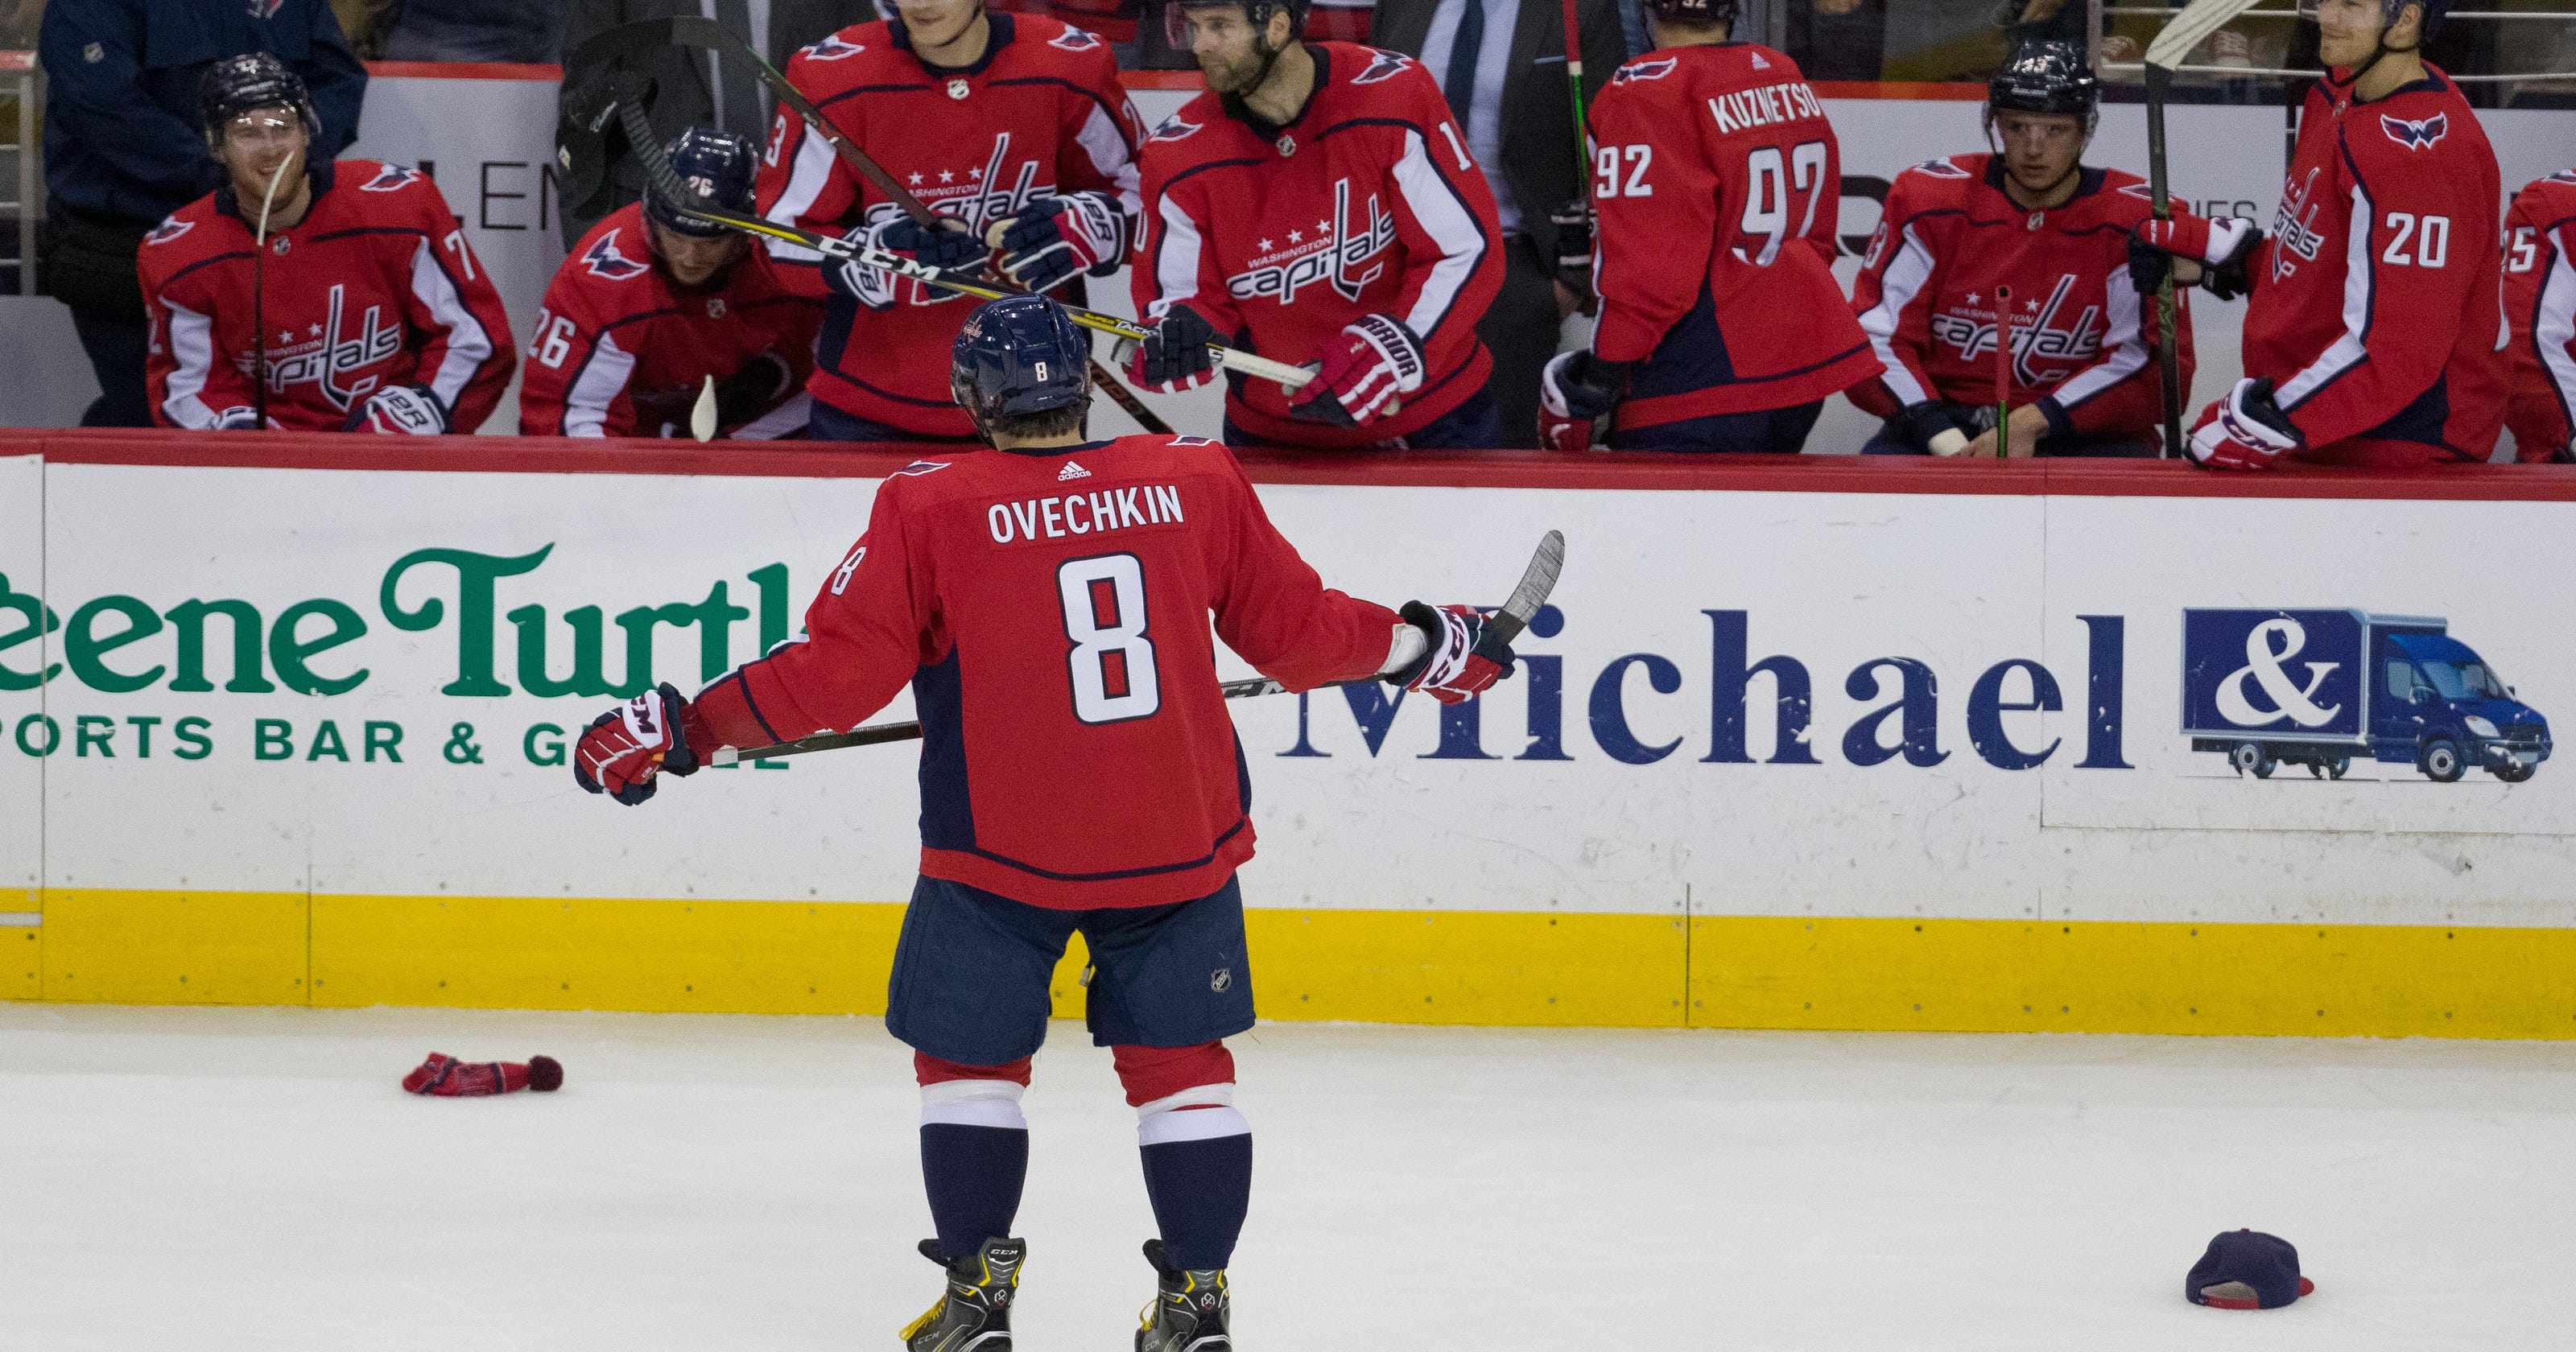 c2d93c0d996 Ovi s 21st hat trick helps Caps to 6-2 rout of Red Wings